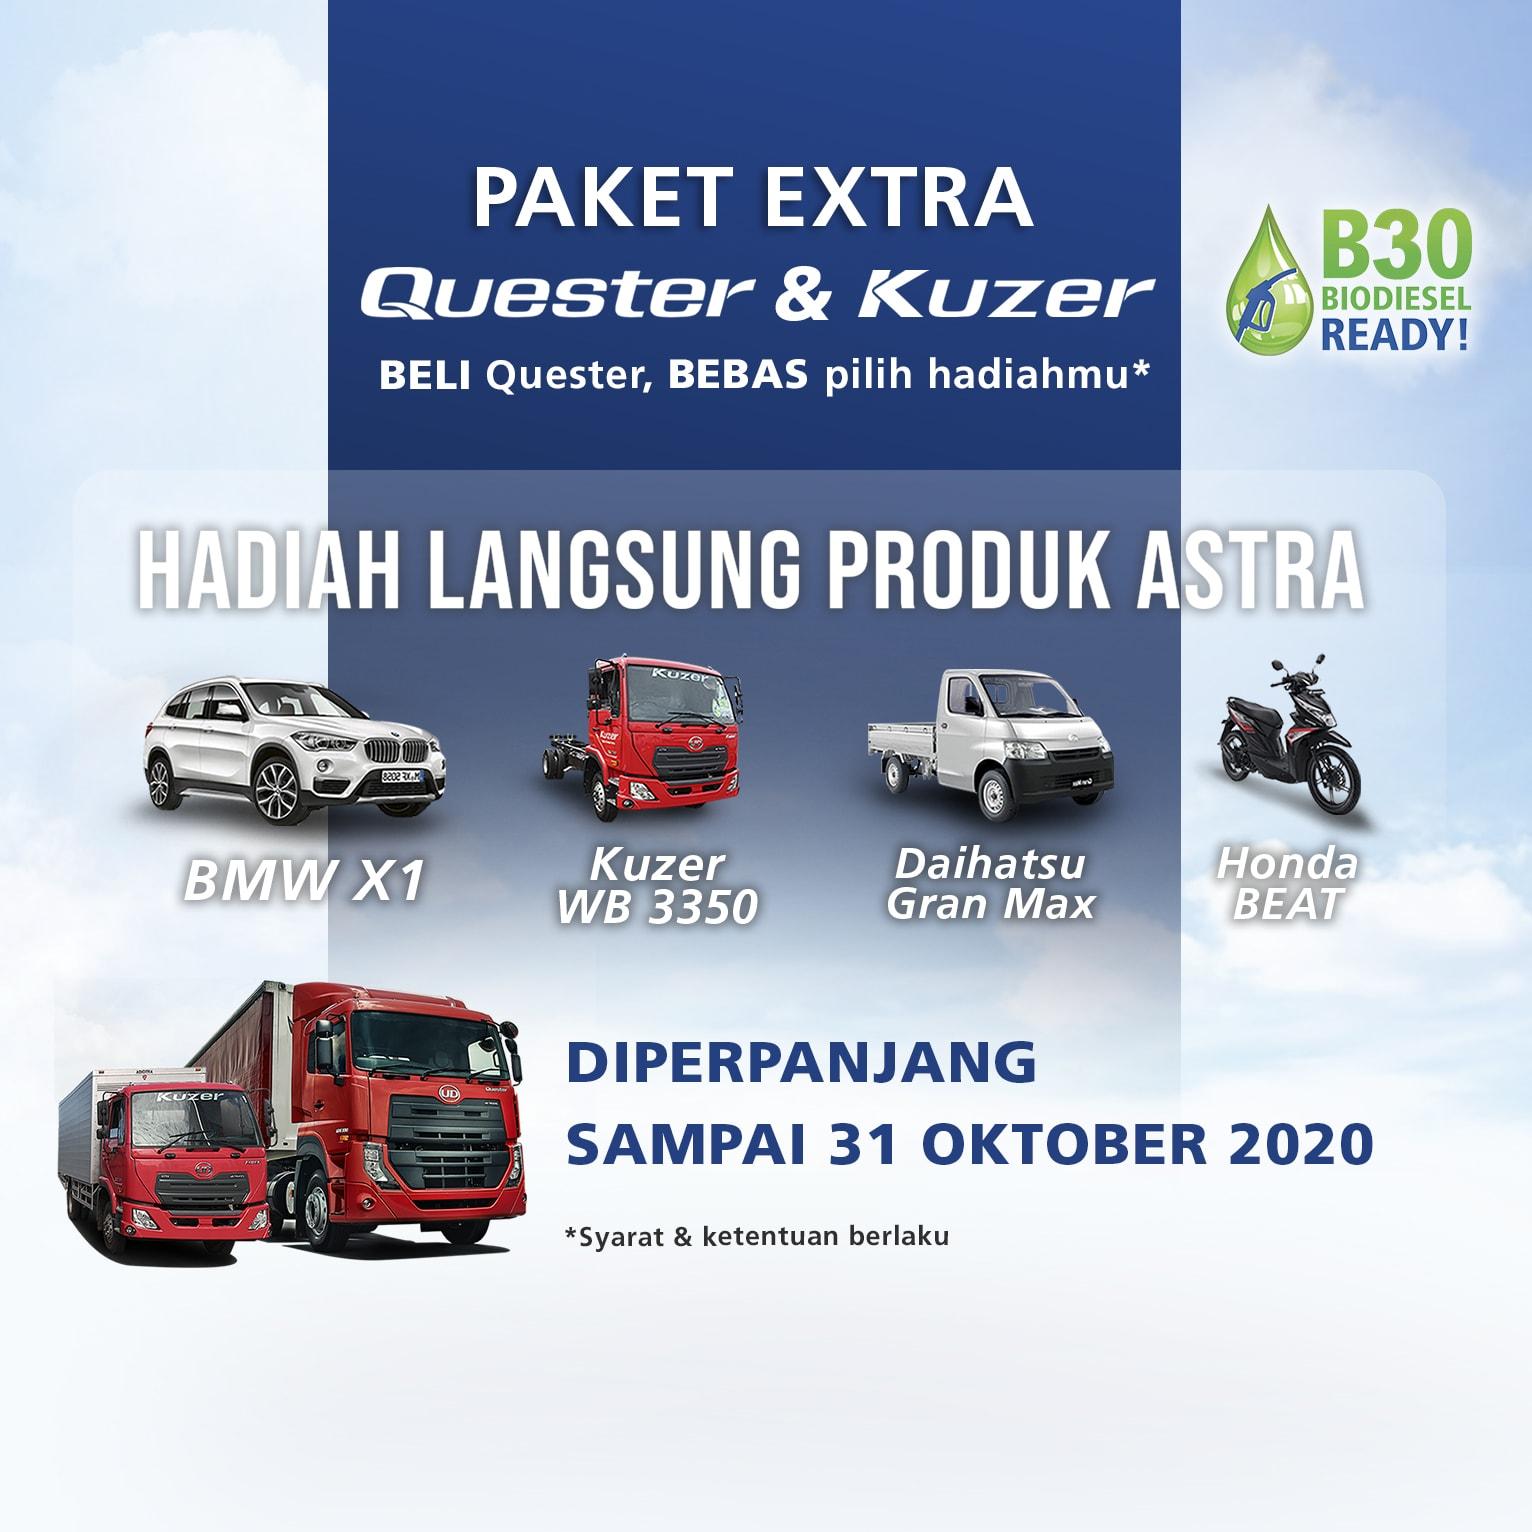 Paket Extra Quester & Kuzer